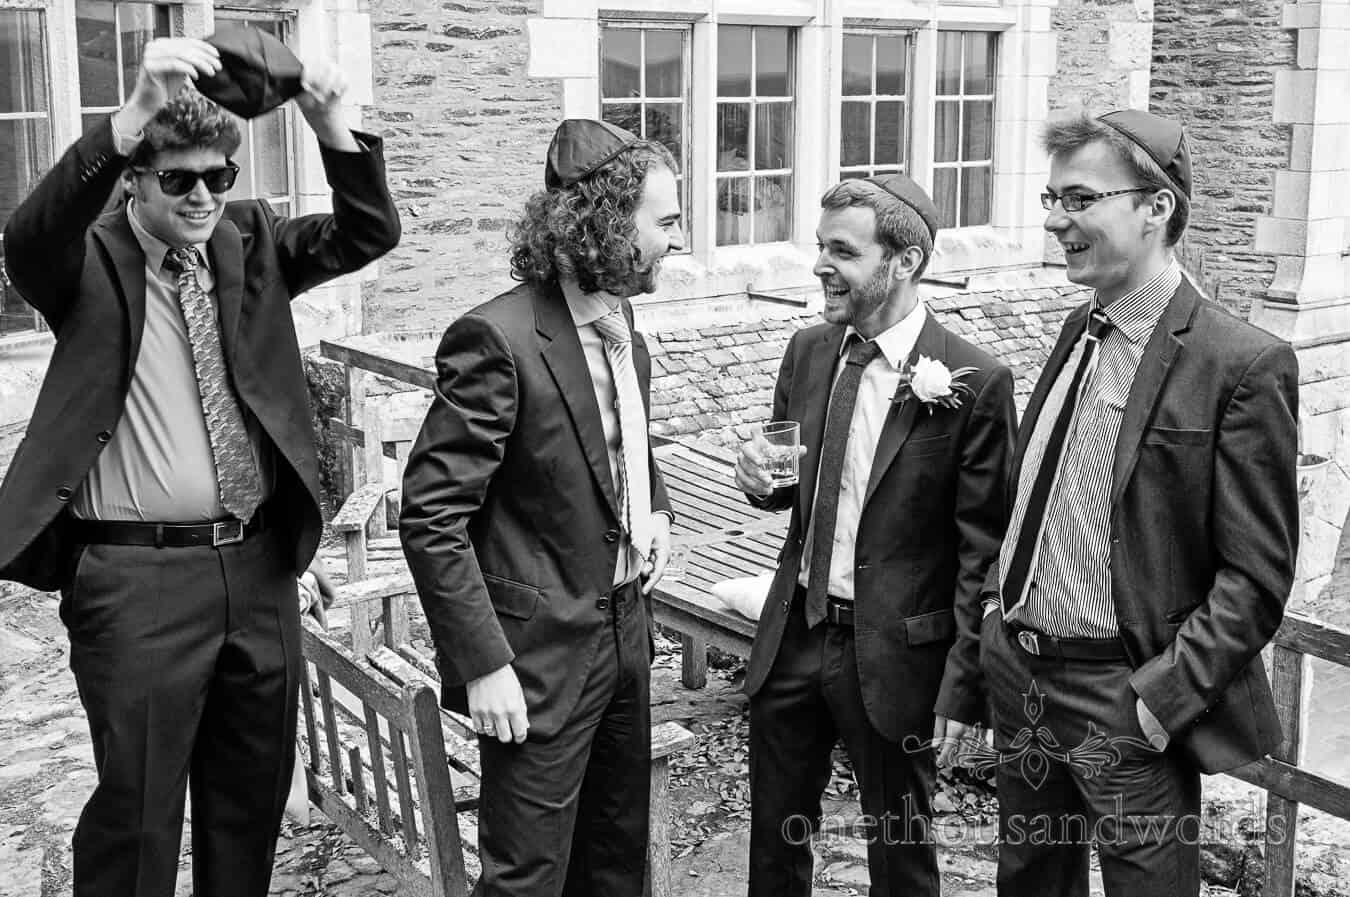 Groomsmen put on their kippas for Jewish wedding cermony